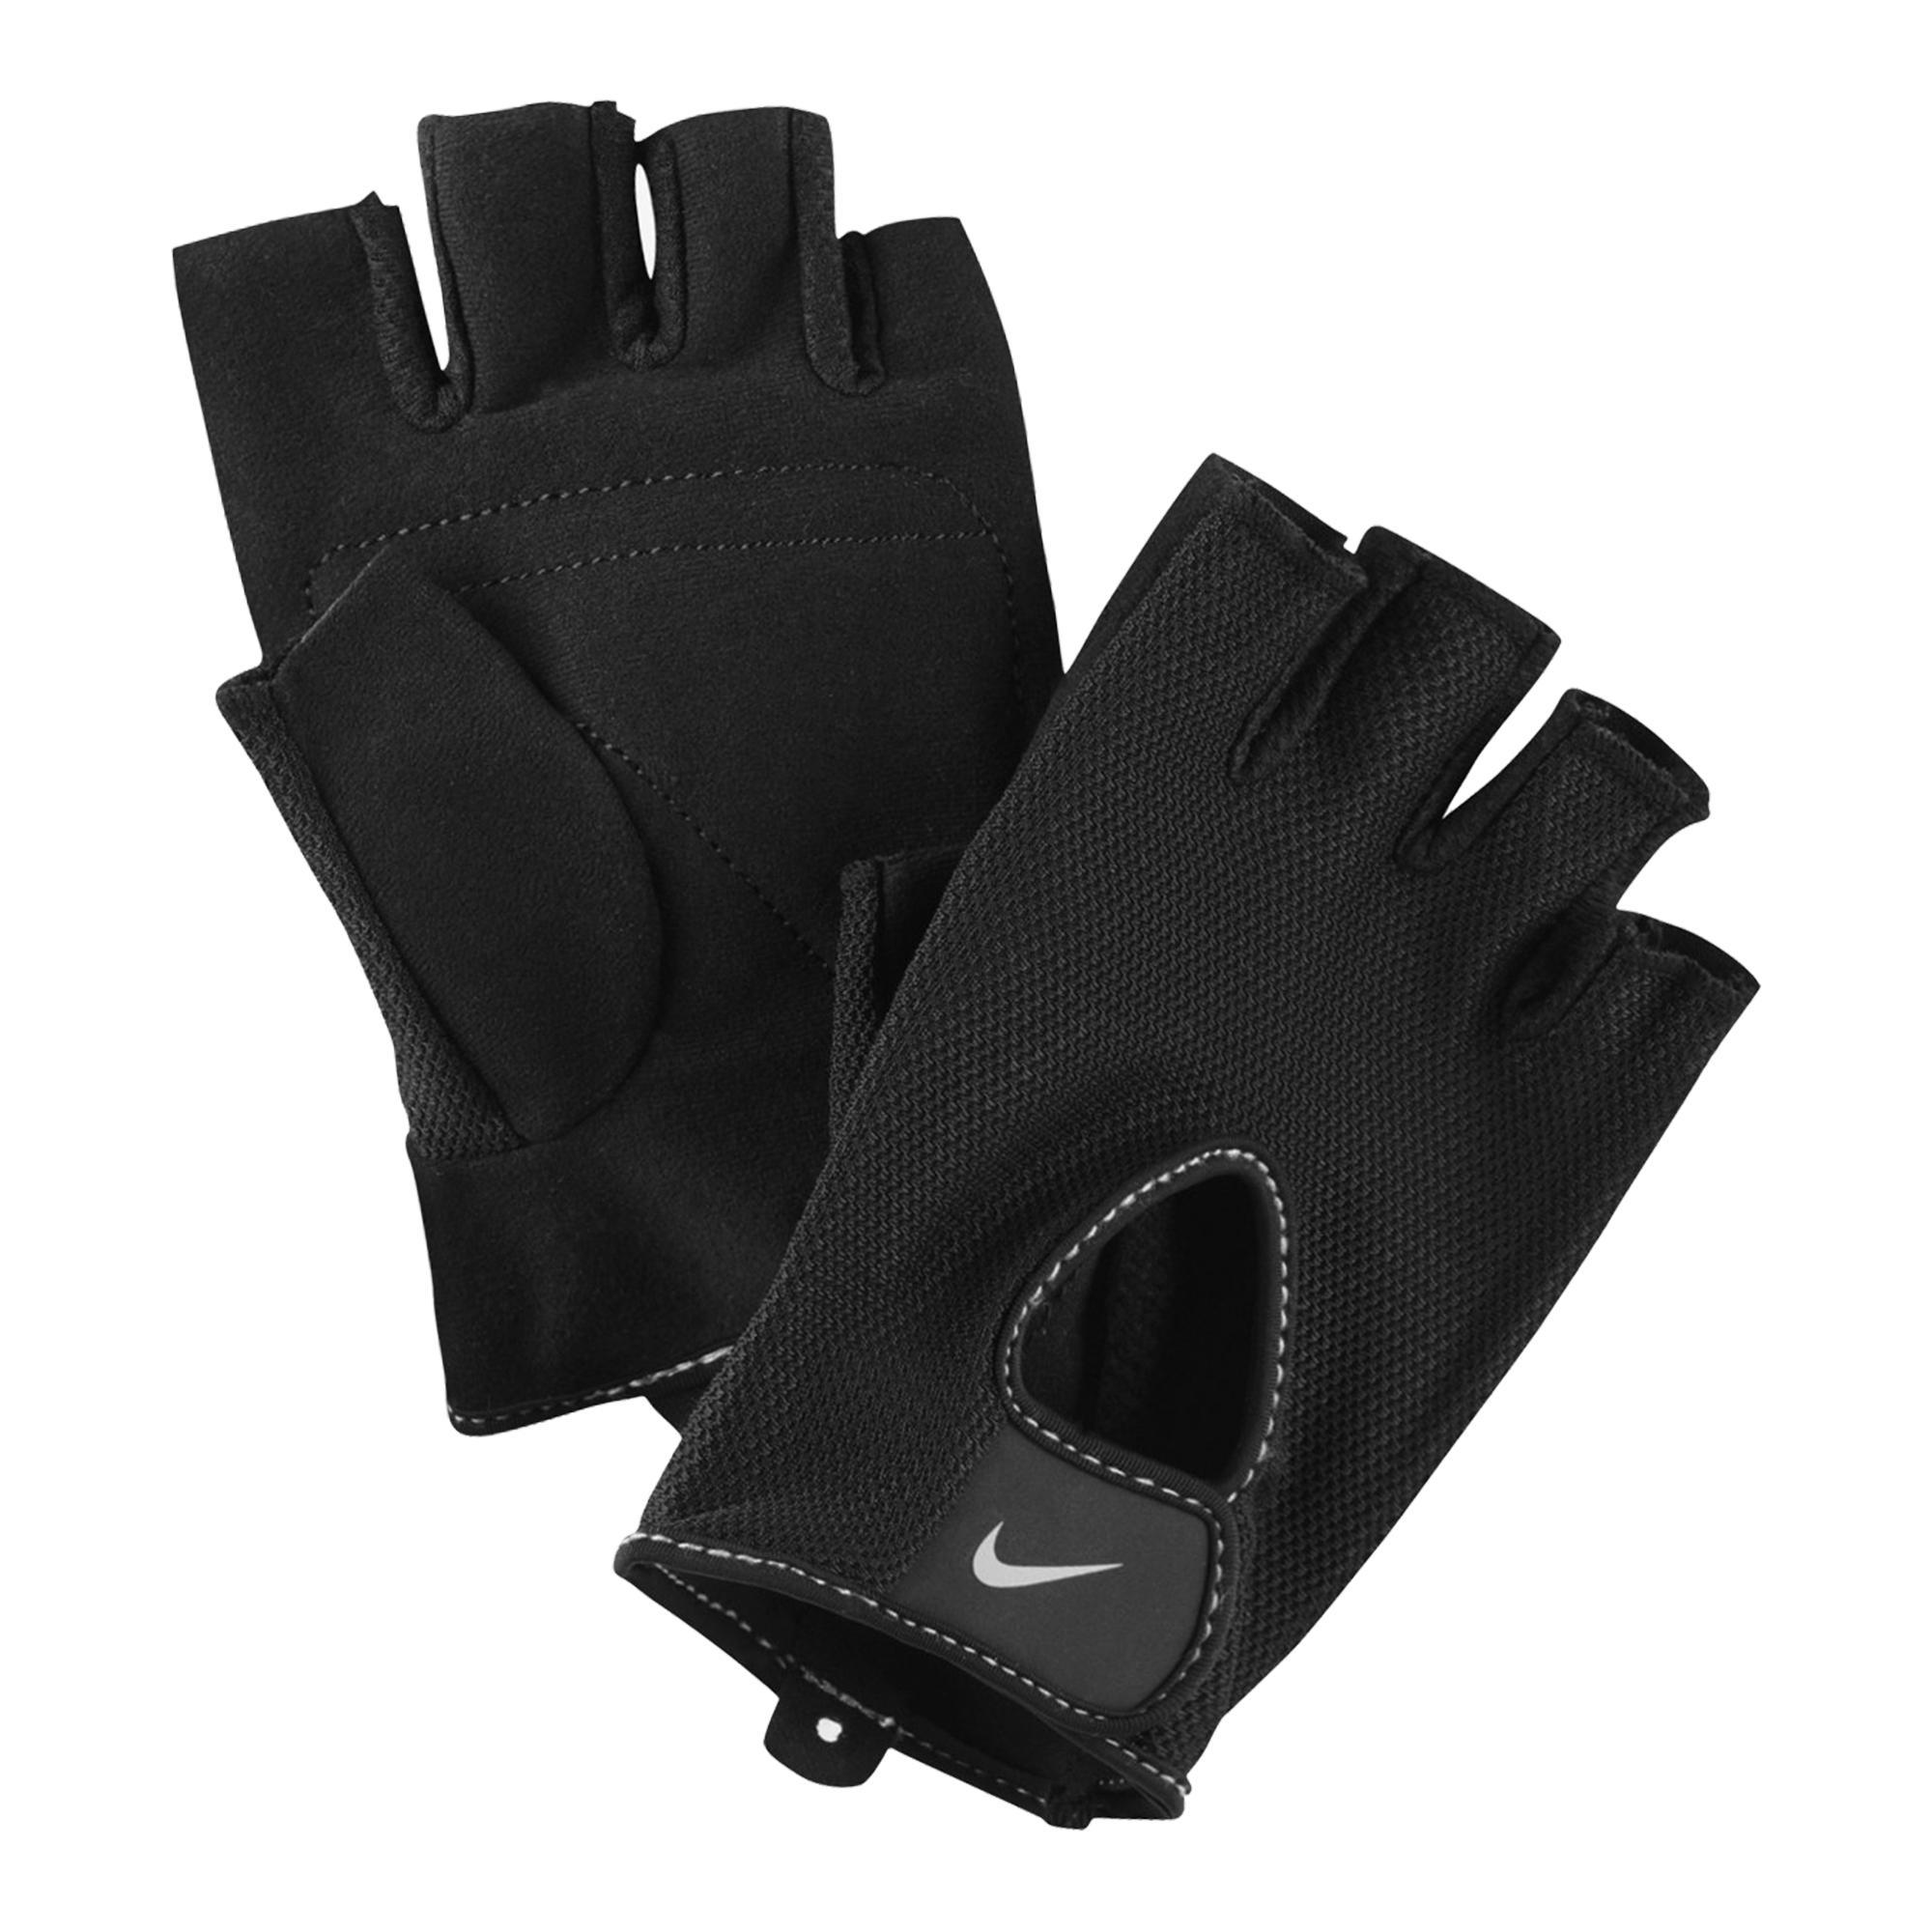 Nike Fundamental Training Gloves: Nike Fundamental Training Gloves Egzersiz Eldiveni #9.092